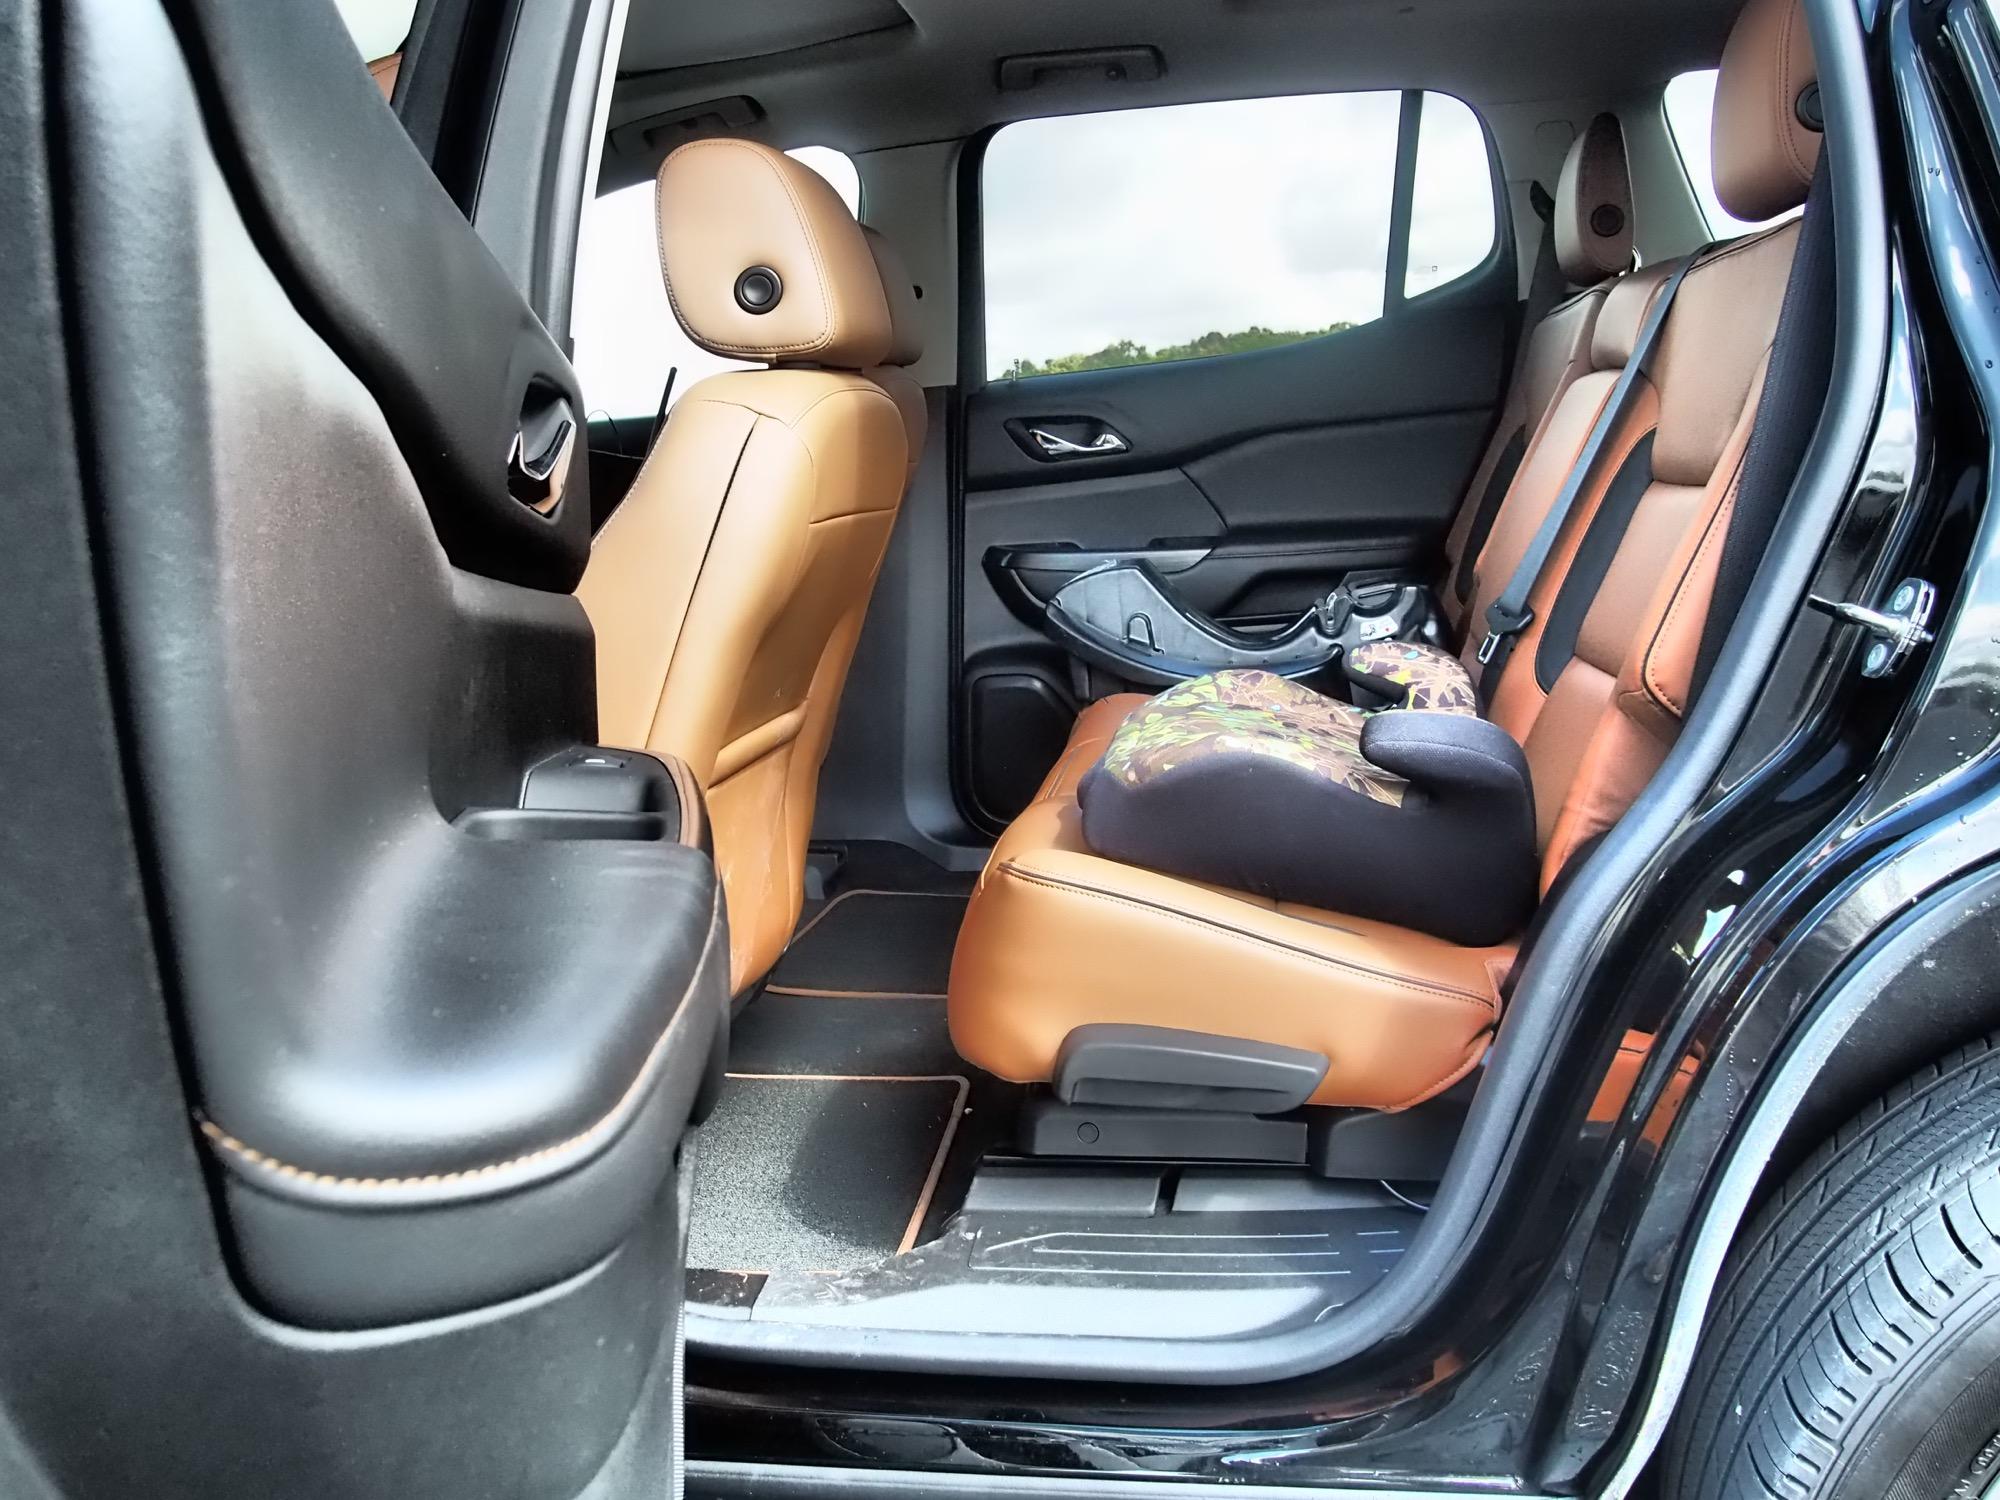 2017 gmc acadia review for Gmc acadia denali 2017 interior